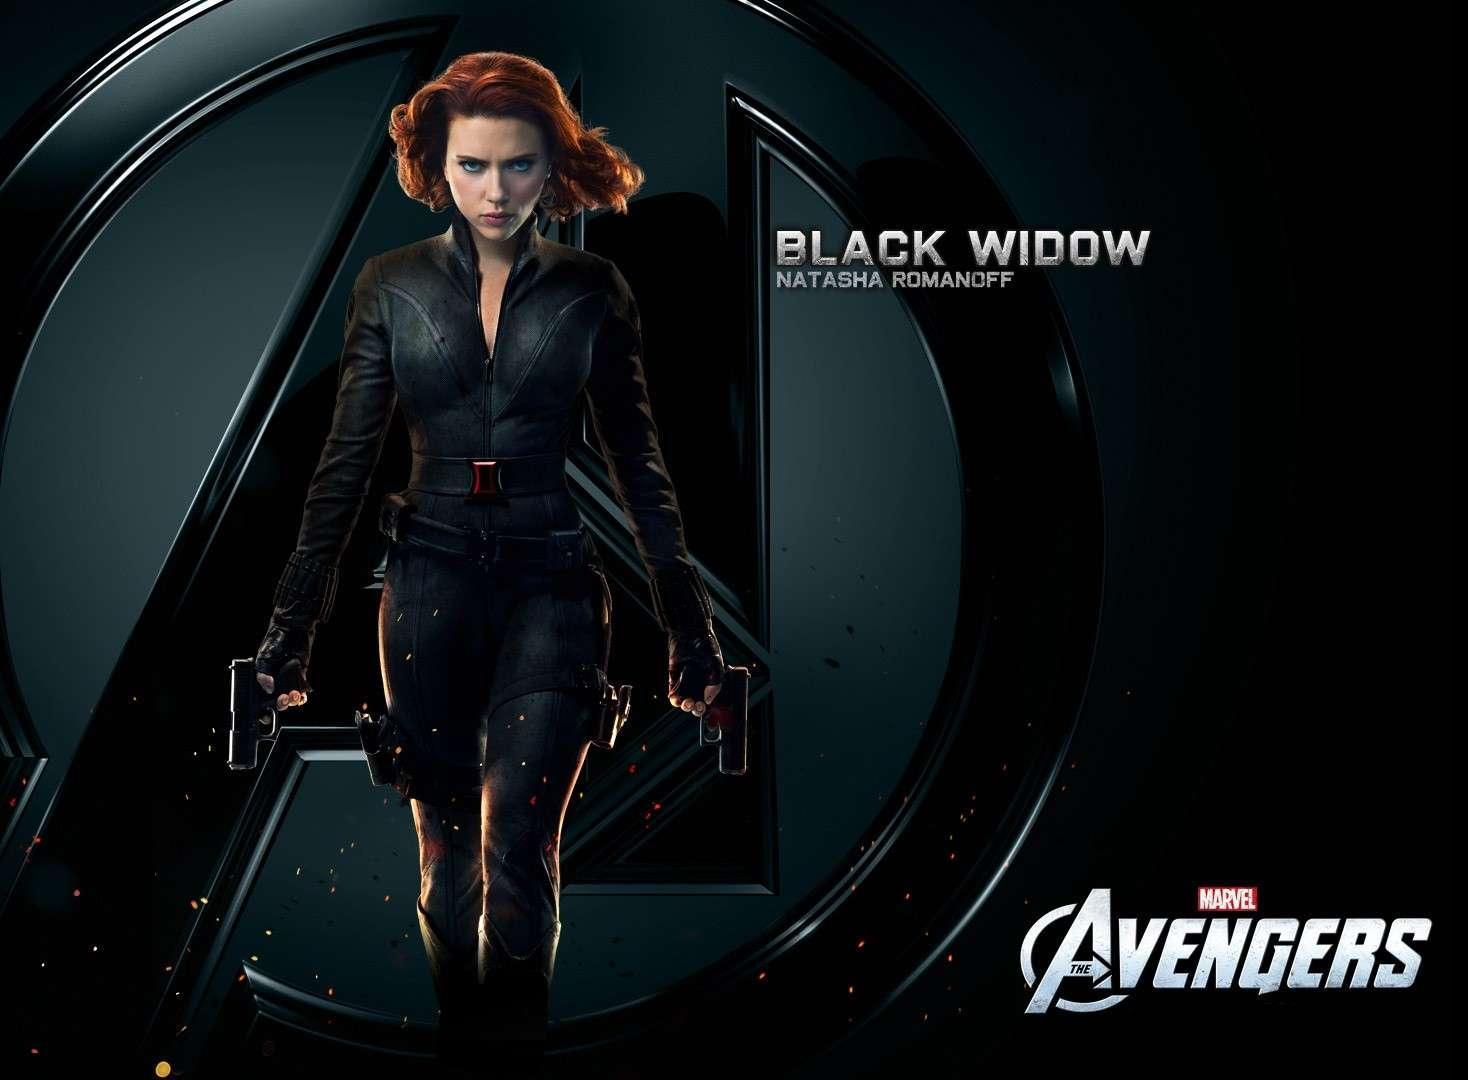 Black Widow   The Avengers   Black Widow Photo 30737253 1468x1080